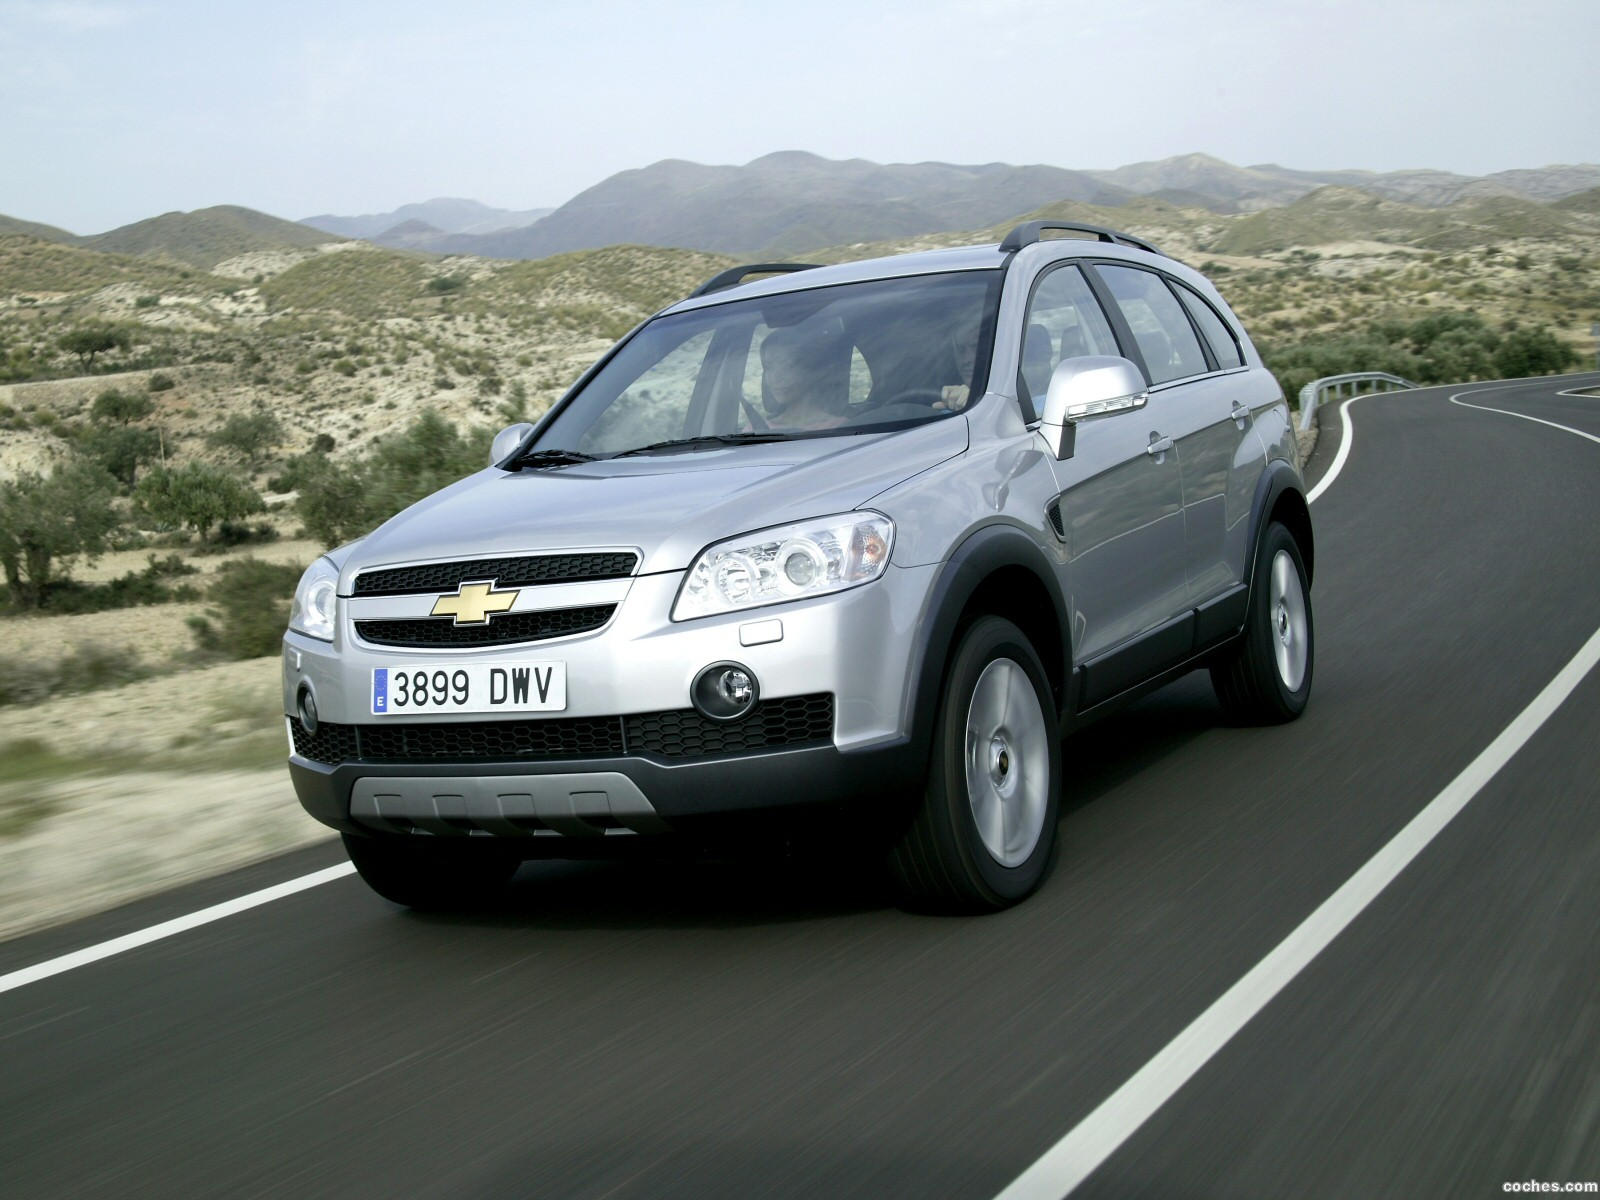 Foto 2 de Chevrolet Captiva 2006